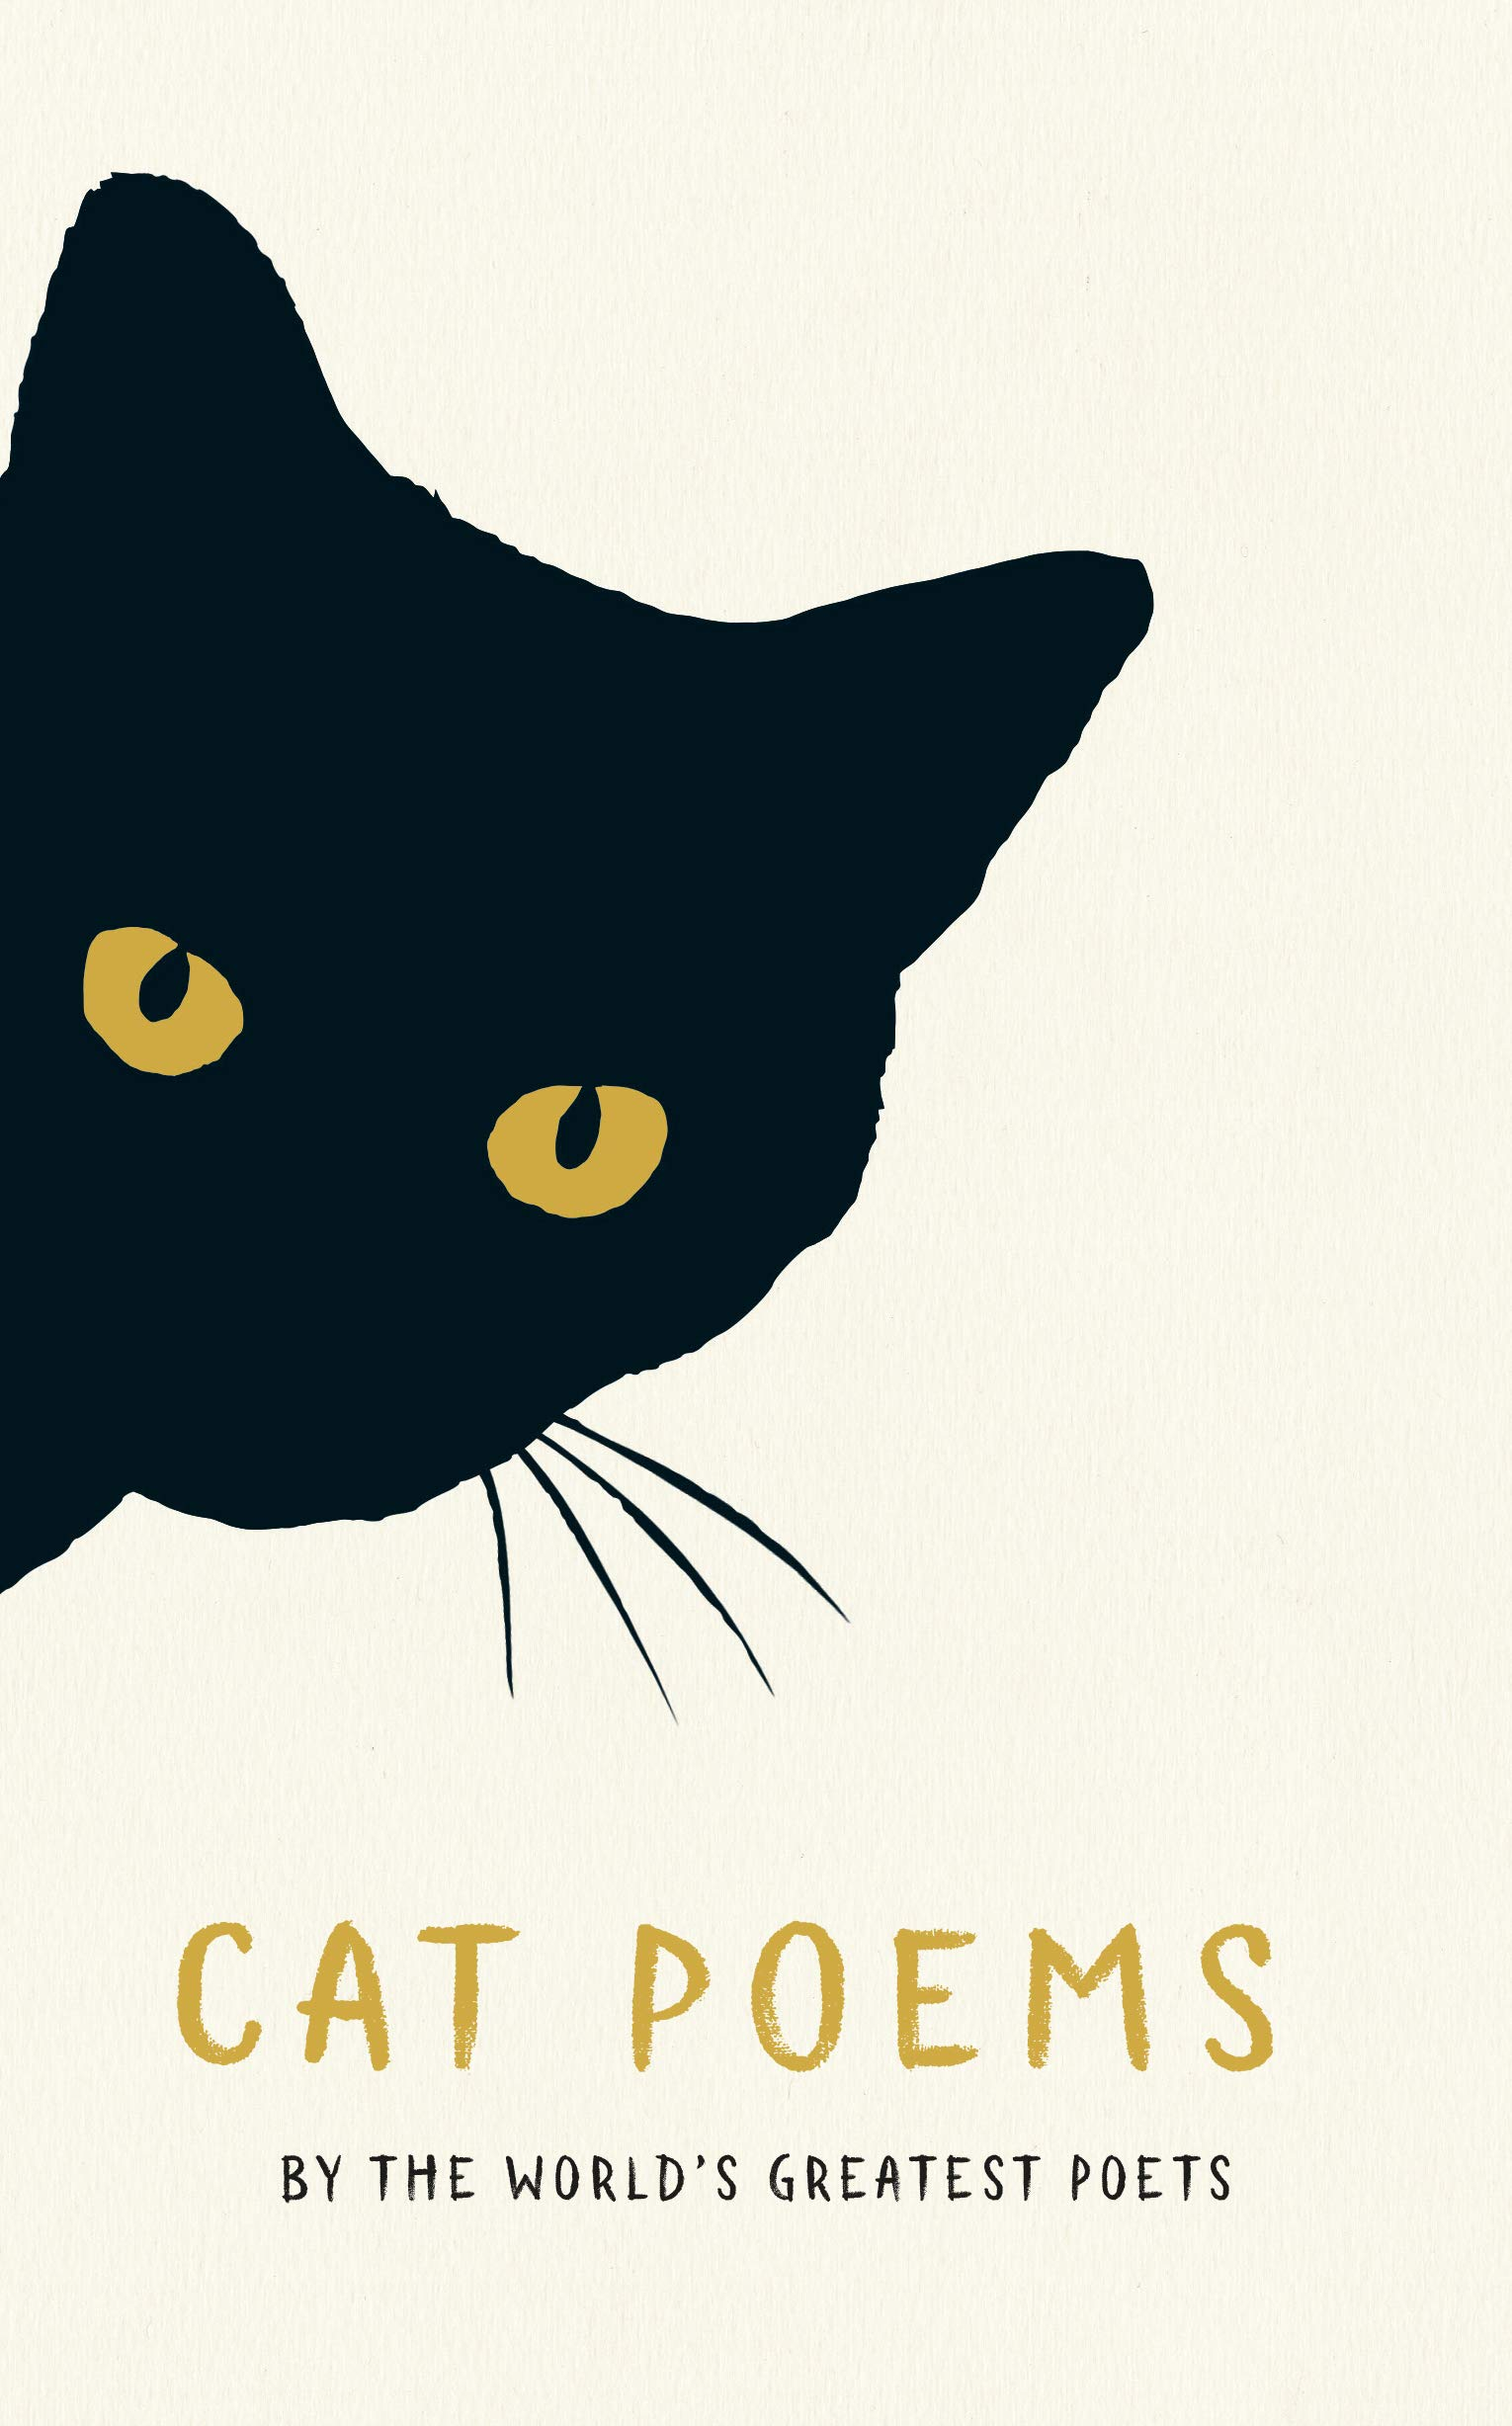 Cat Poems by W.B. Yeats, Rainer Maria Rilke, Amy Lowell, Charles Baudelaire, Stevie Smith, William Carlos Williams, Ezra Pound, Elizabeth Bishop